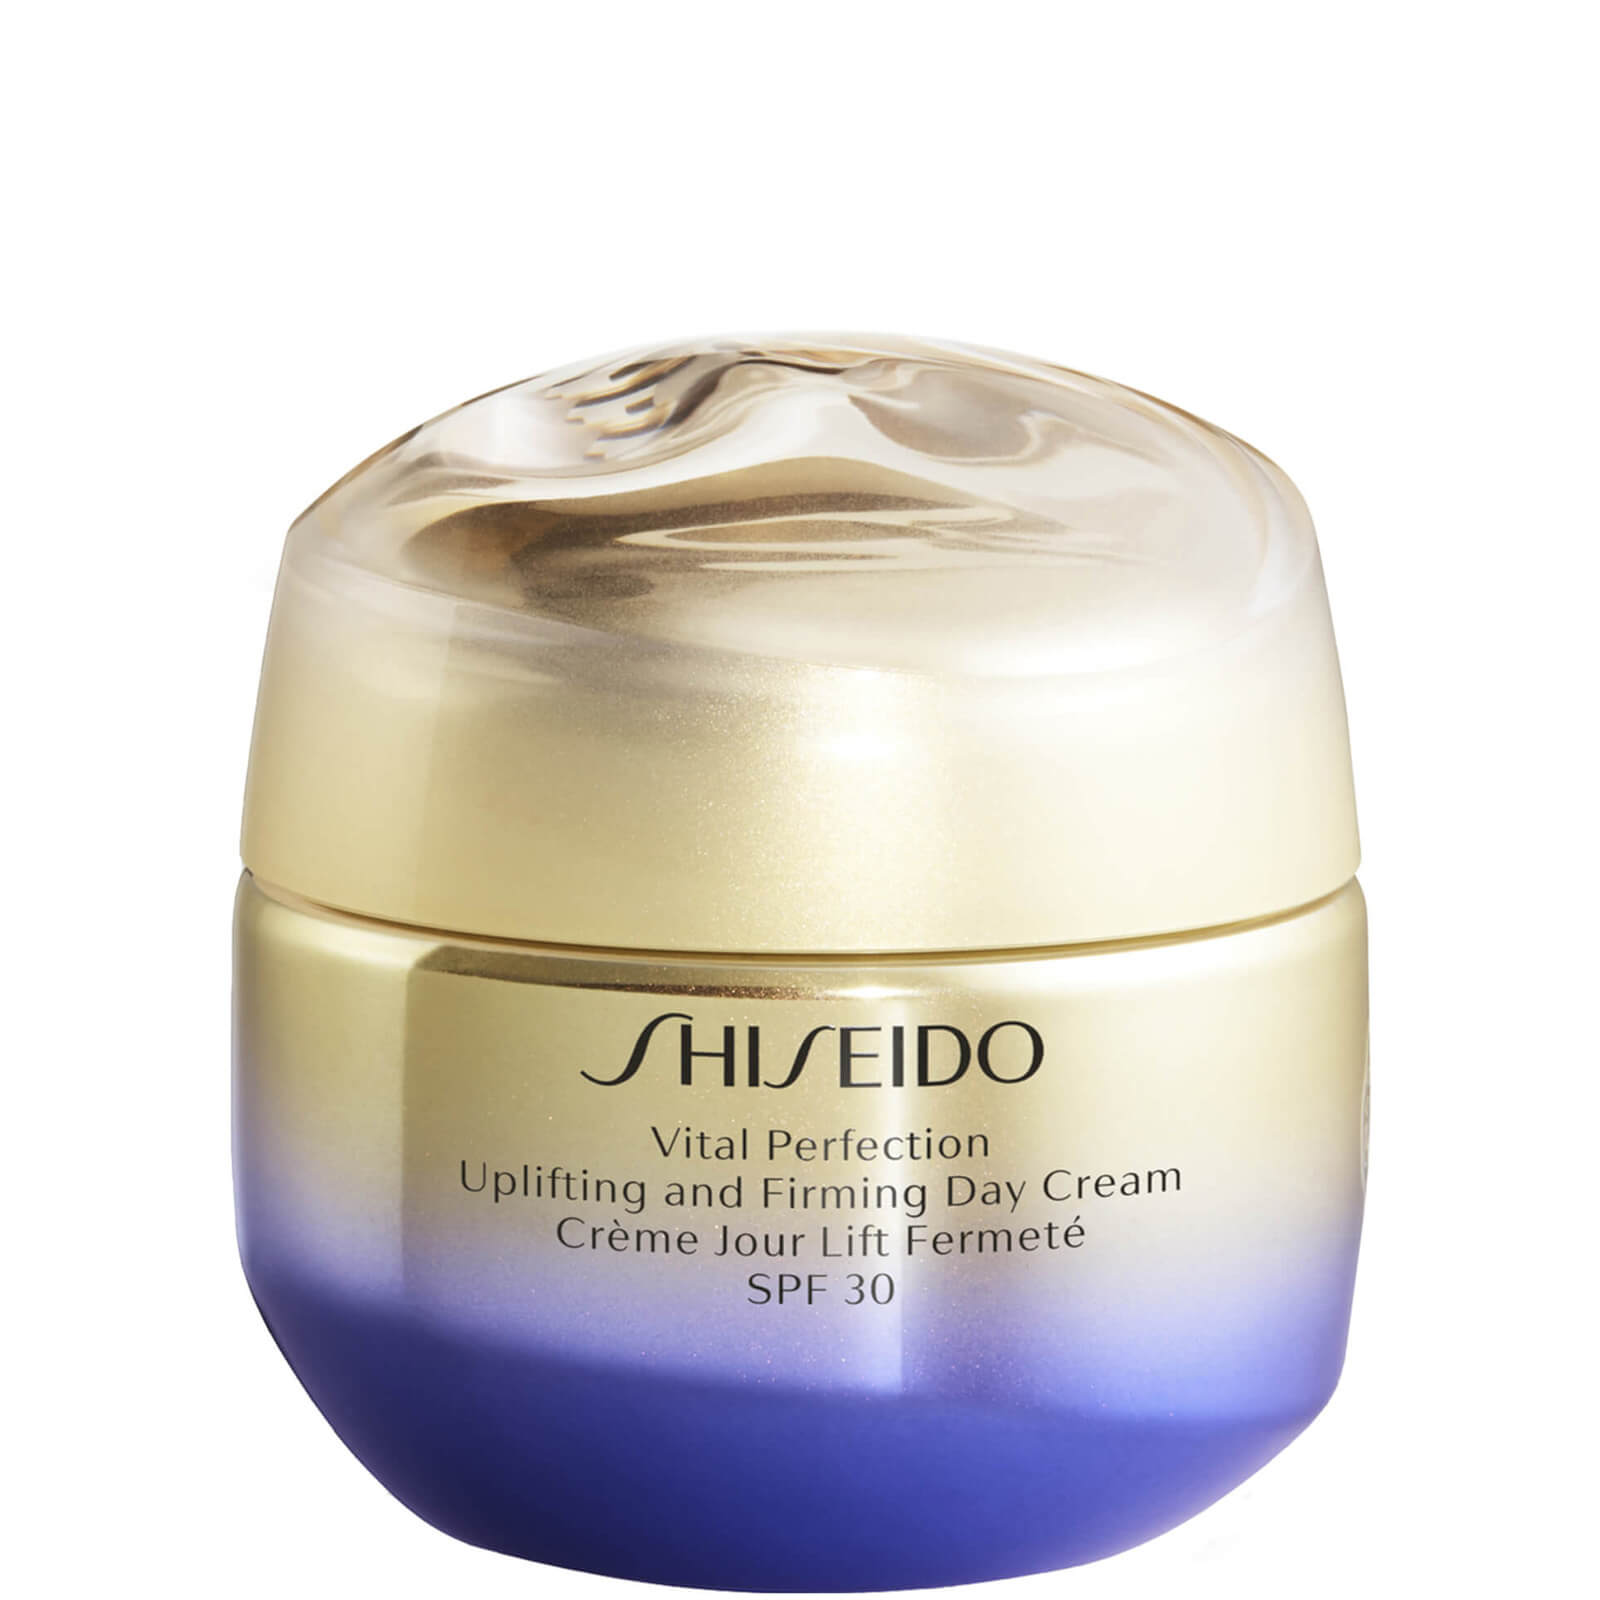 Купить Shiseido Vital Perfection Uplifting and Firming Day Cream SPF30